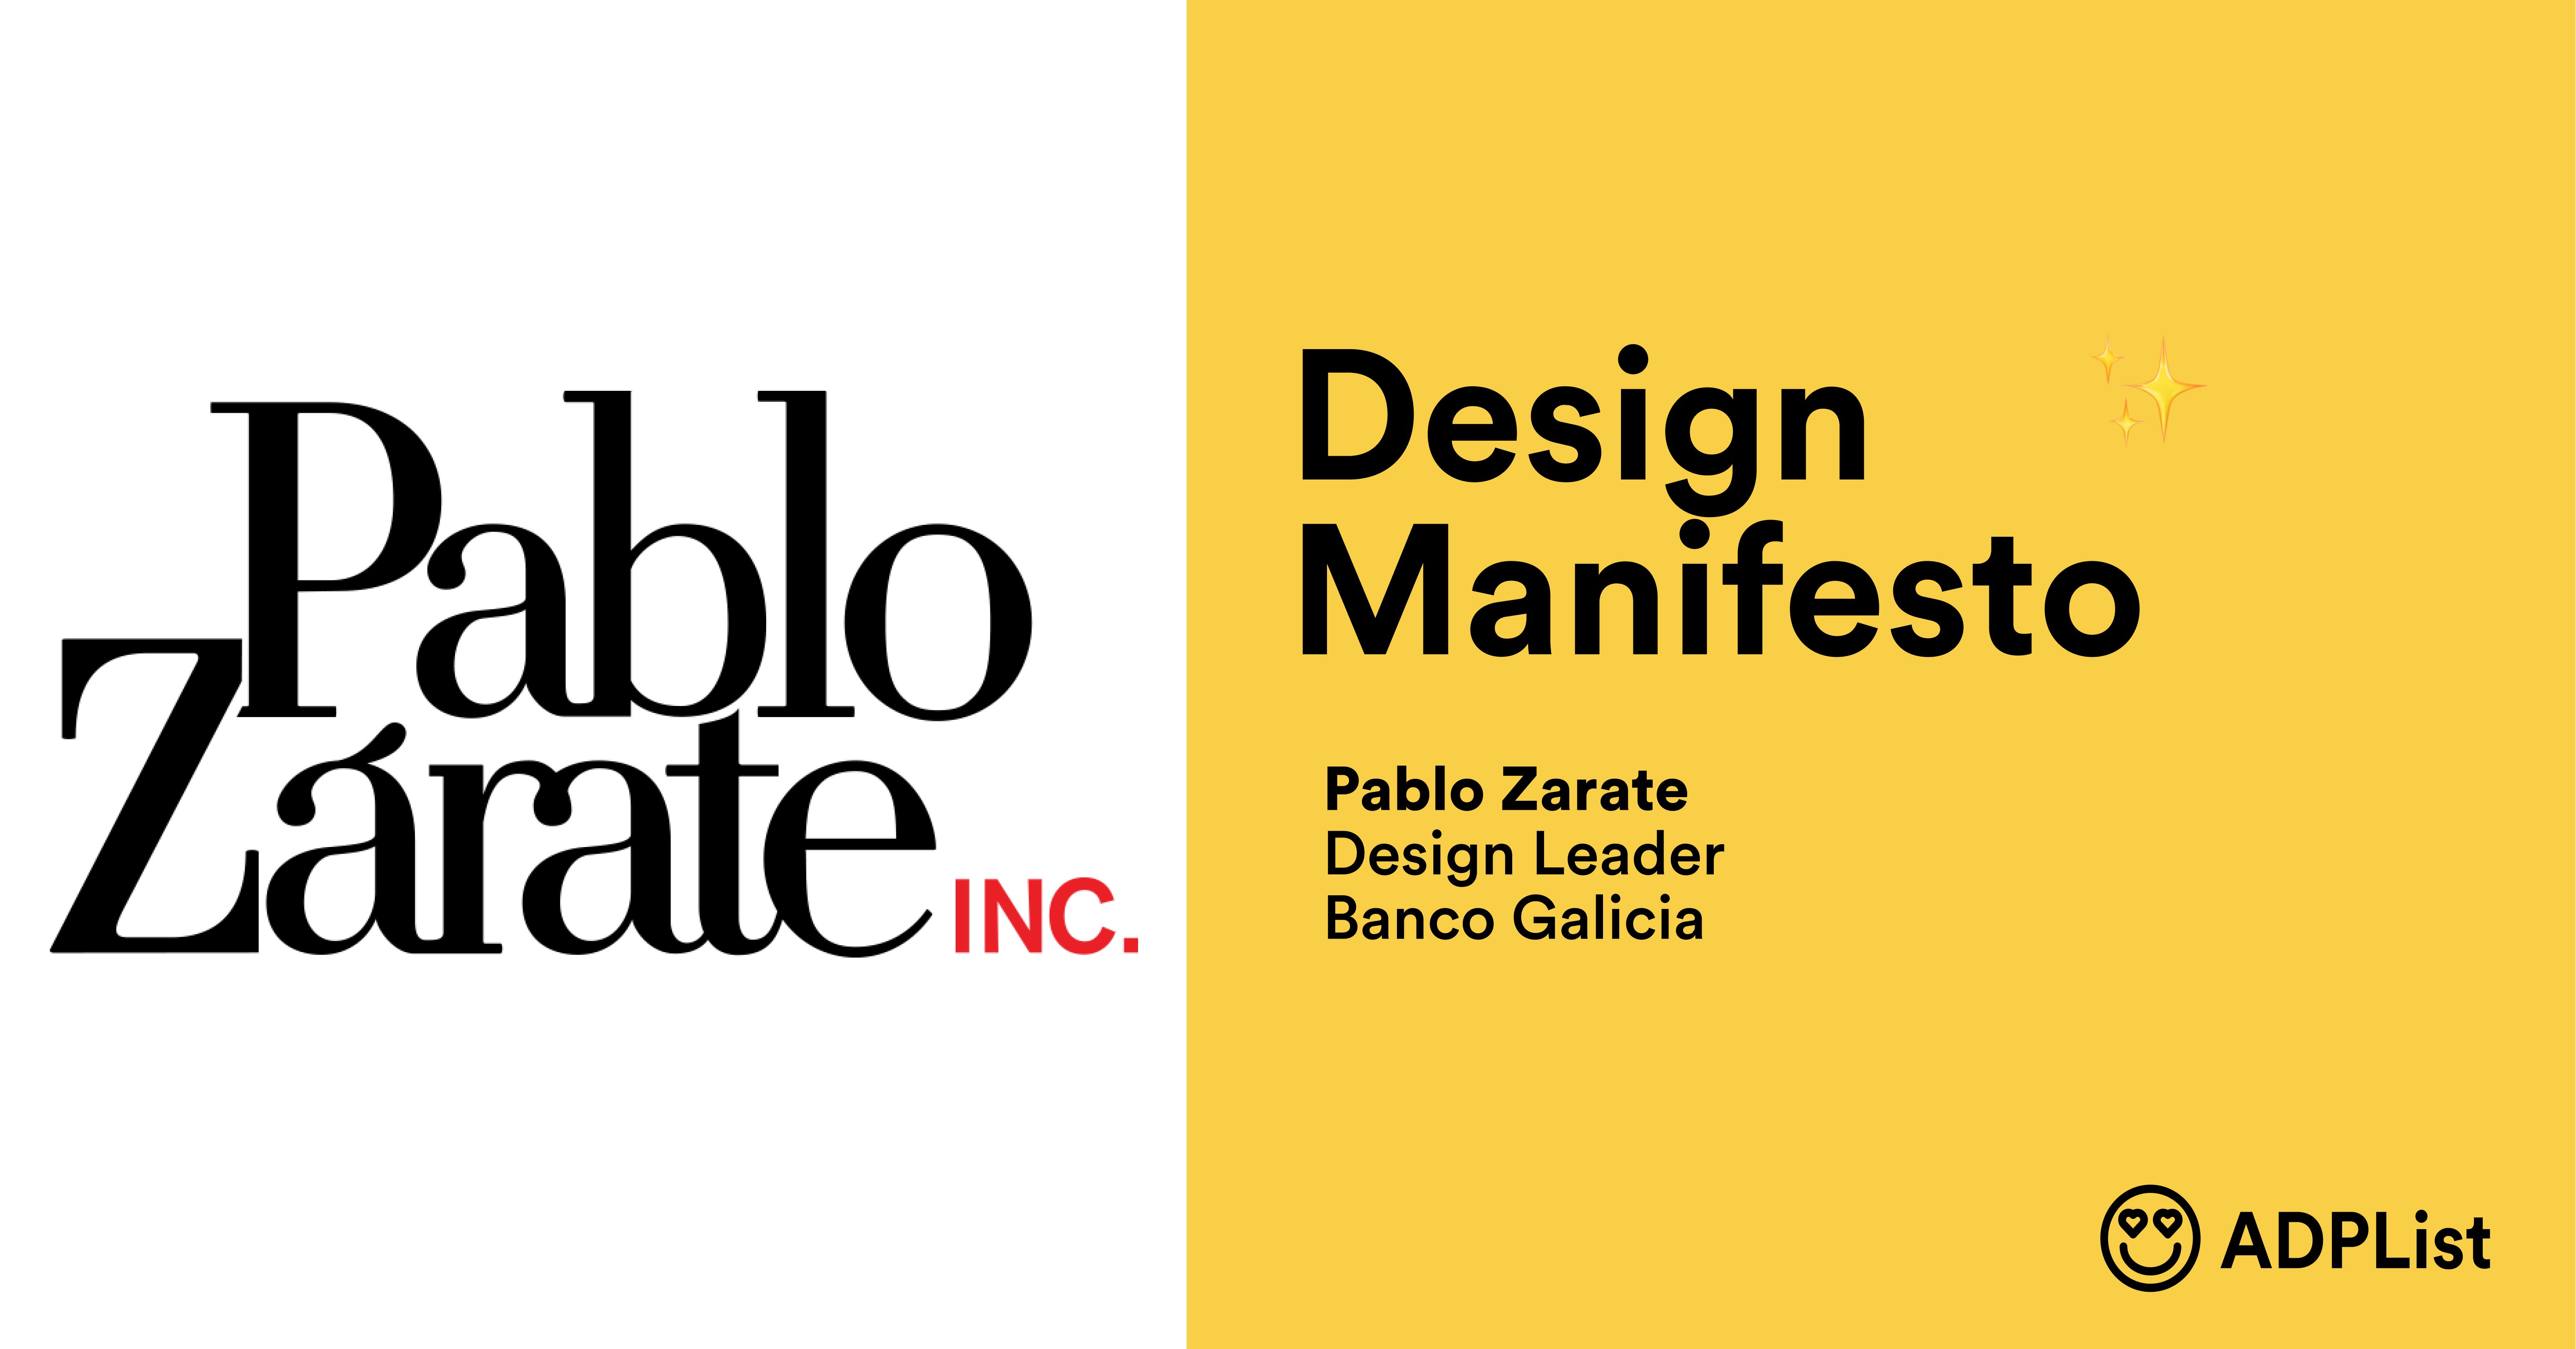 A Design Manifesto